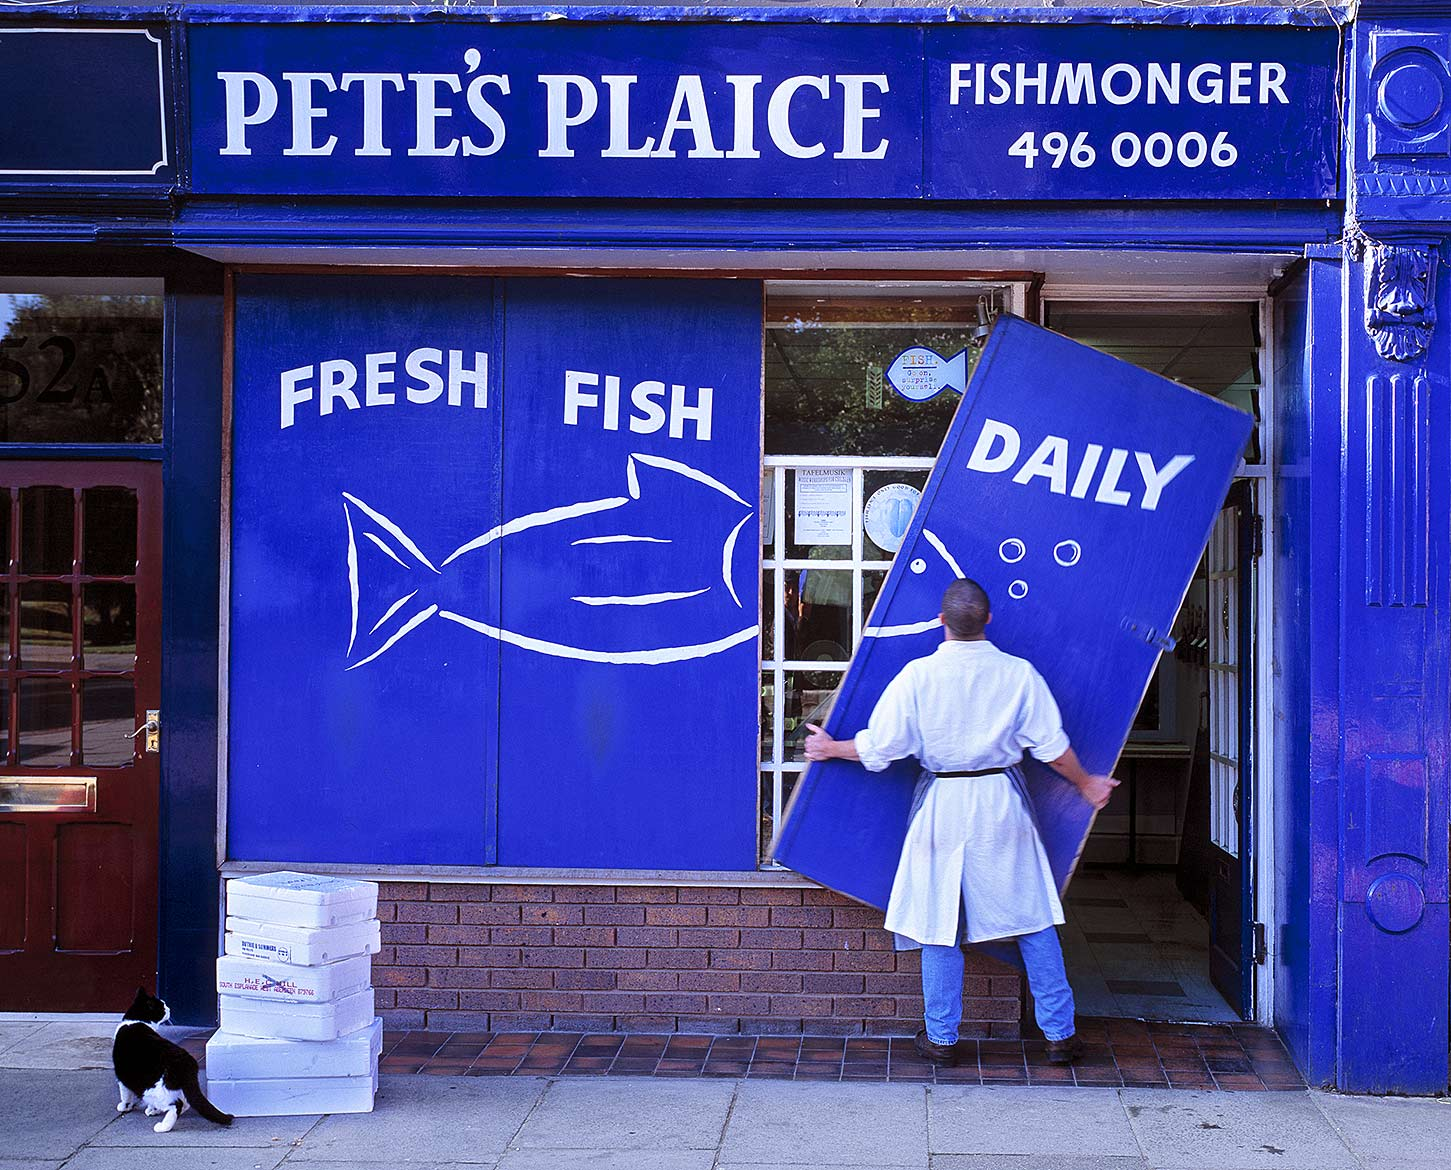 easton_fishmonger_web.jpg